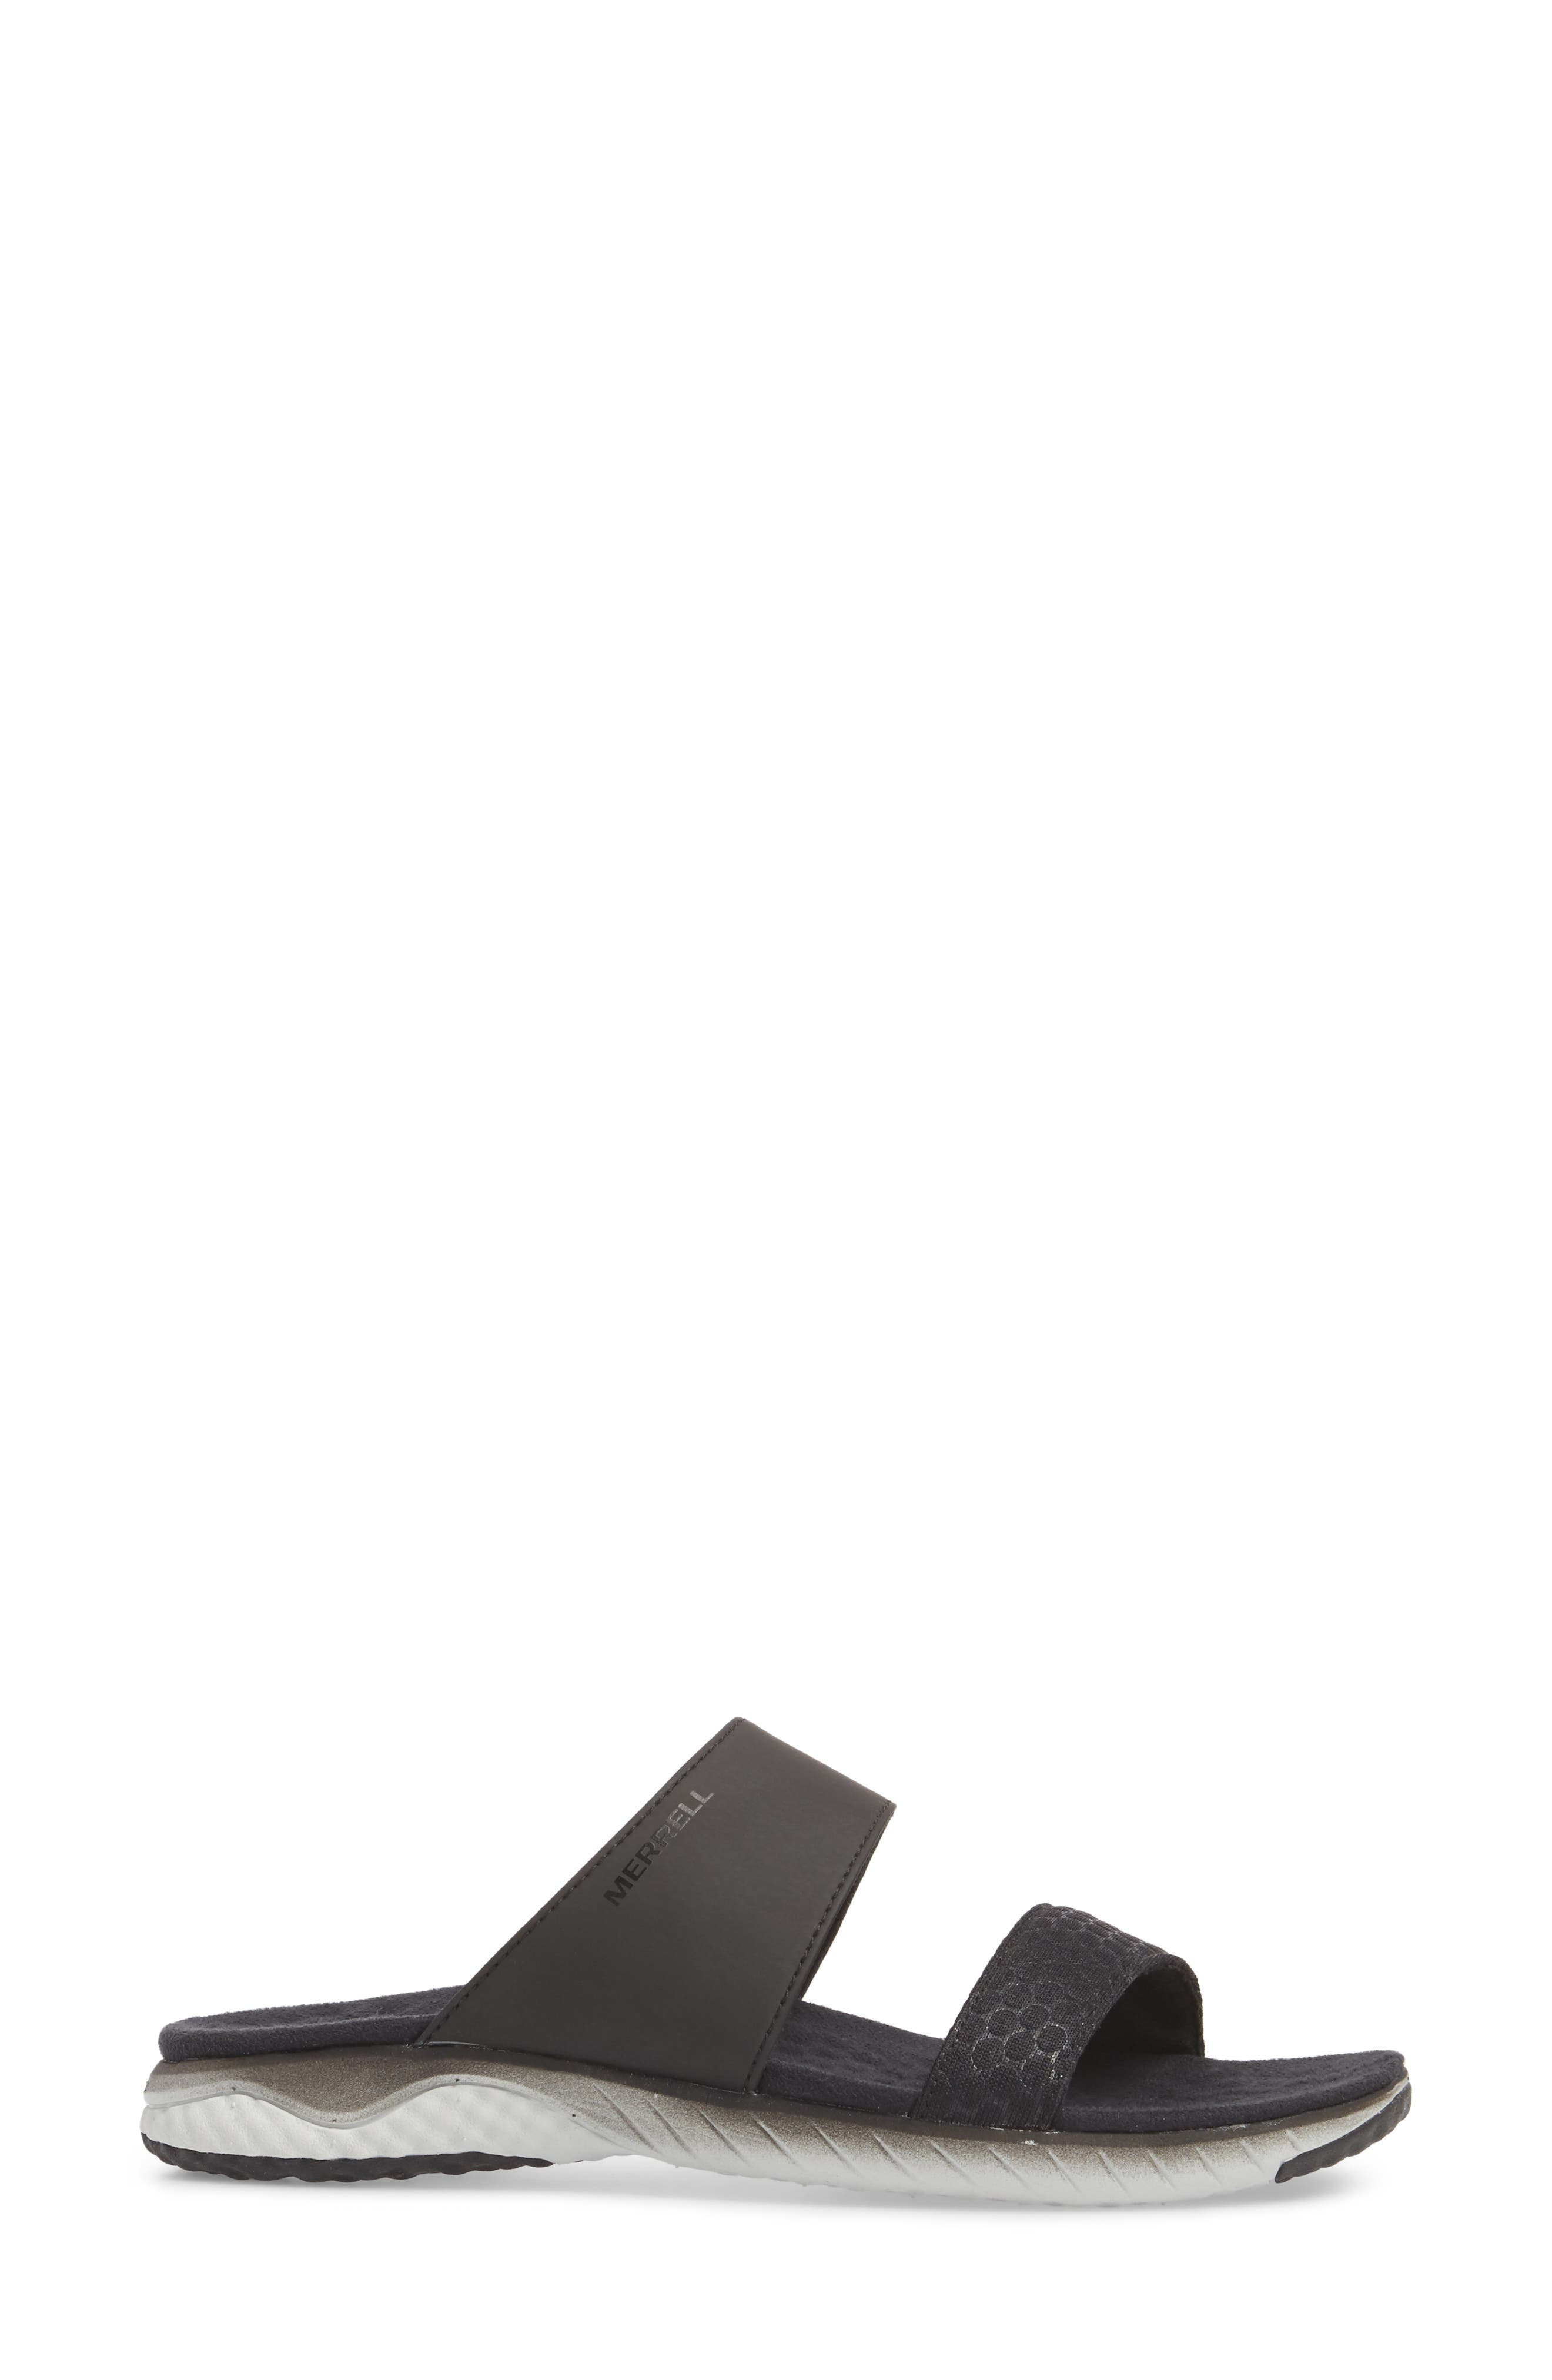 1SIX8 Linna Air Cushion+ Slide Sandal,                             Alternate thumbnail 9, color,